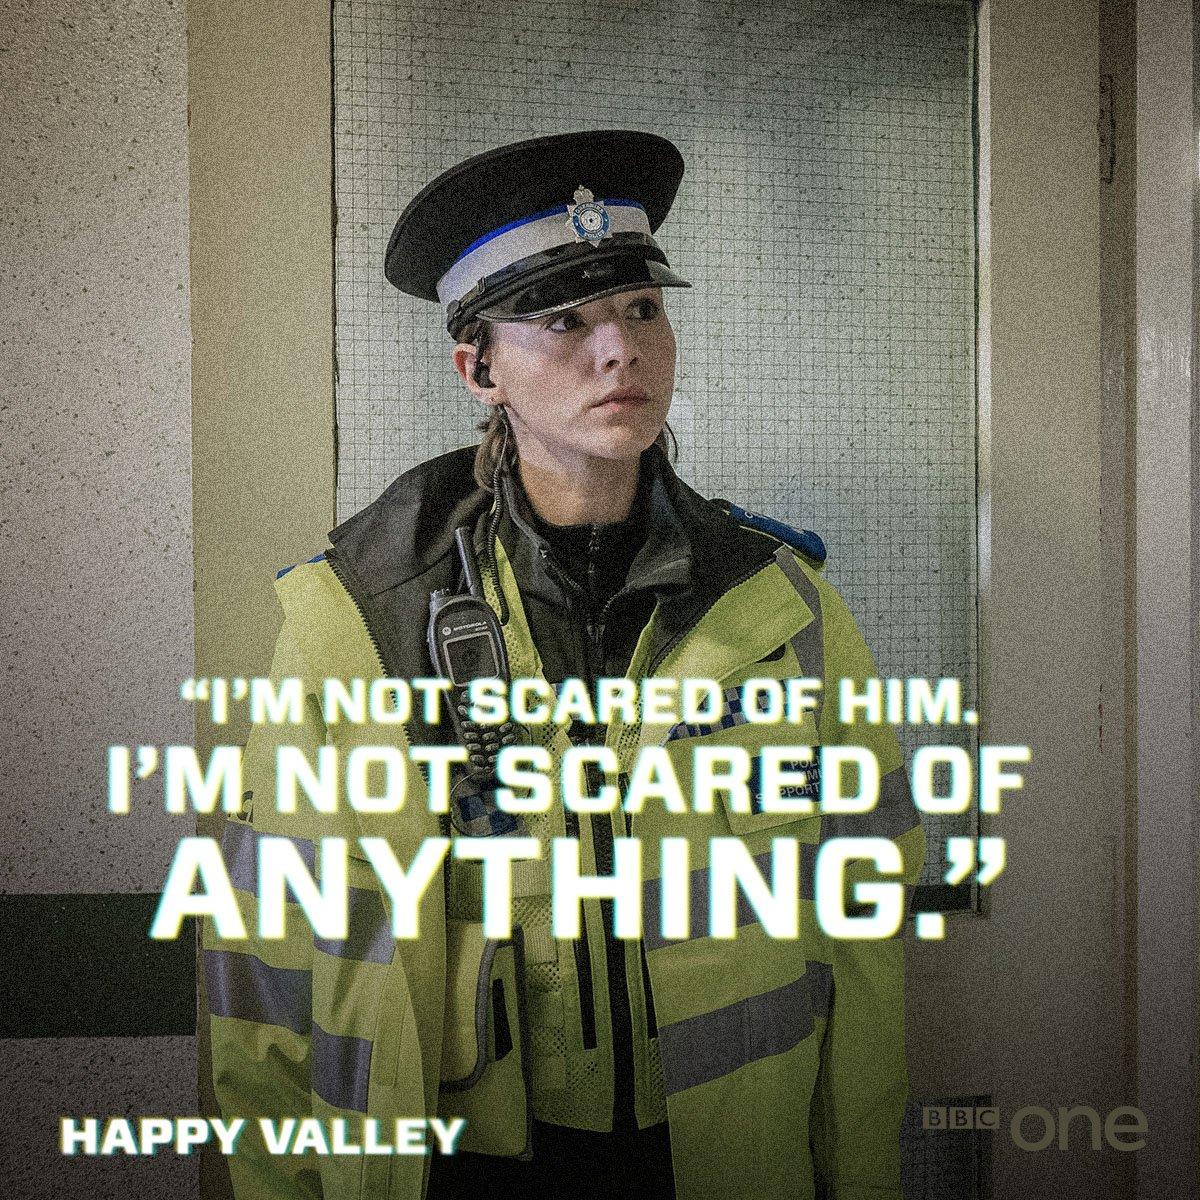 Happy valley BBC, saison 2  - Page 3 CbW2YysUkAApHTR